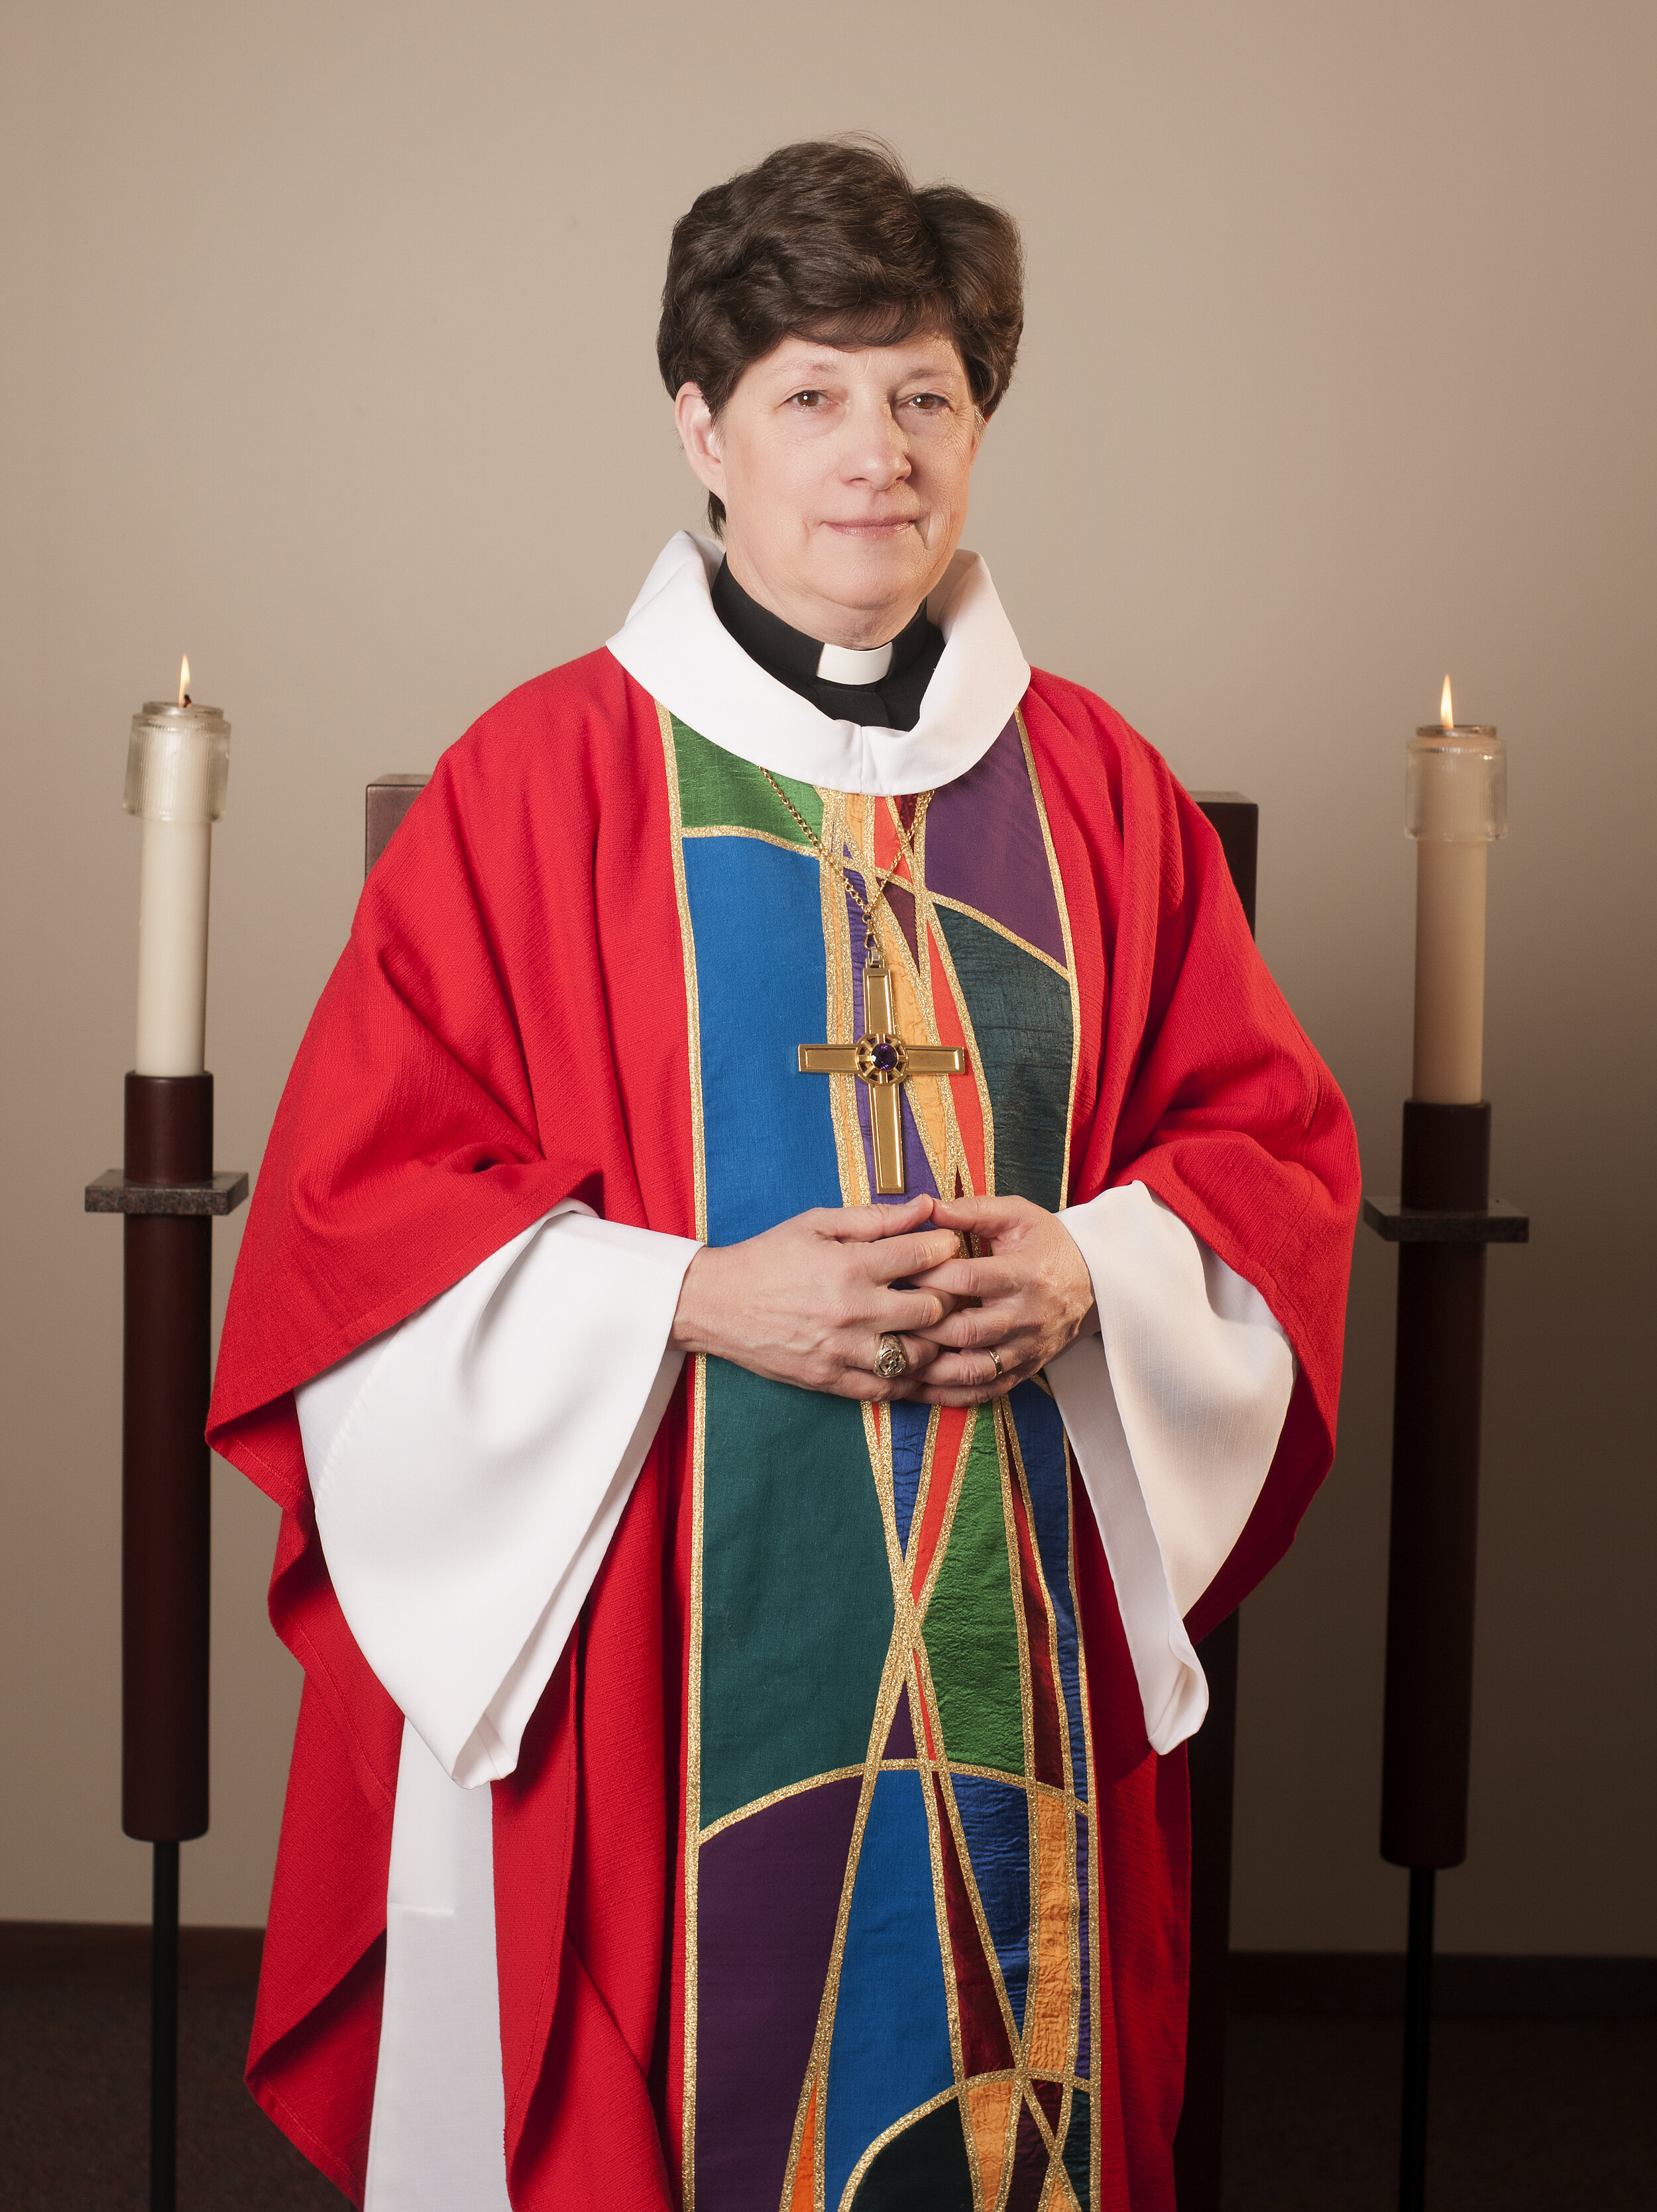 Bishop_Elizabeth_A_Eaton_Select_06.jpg